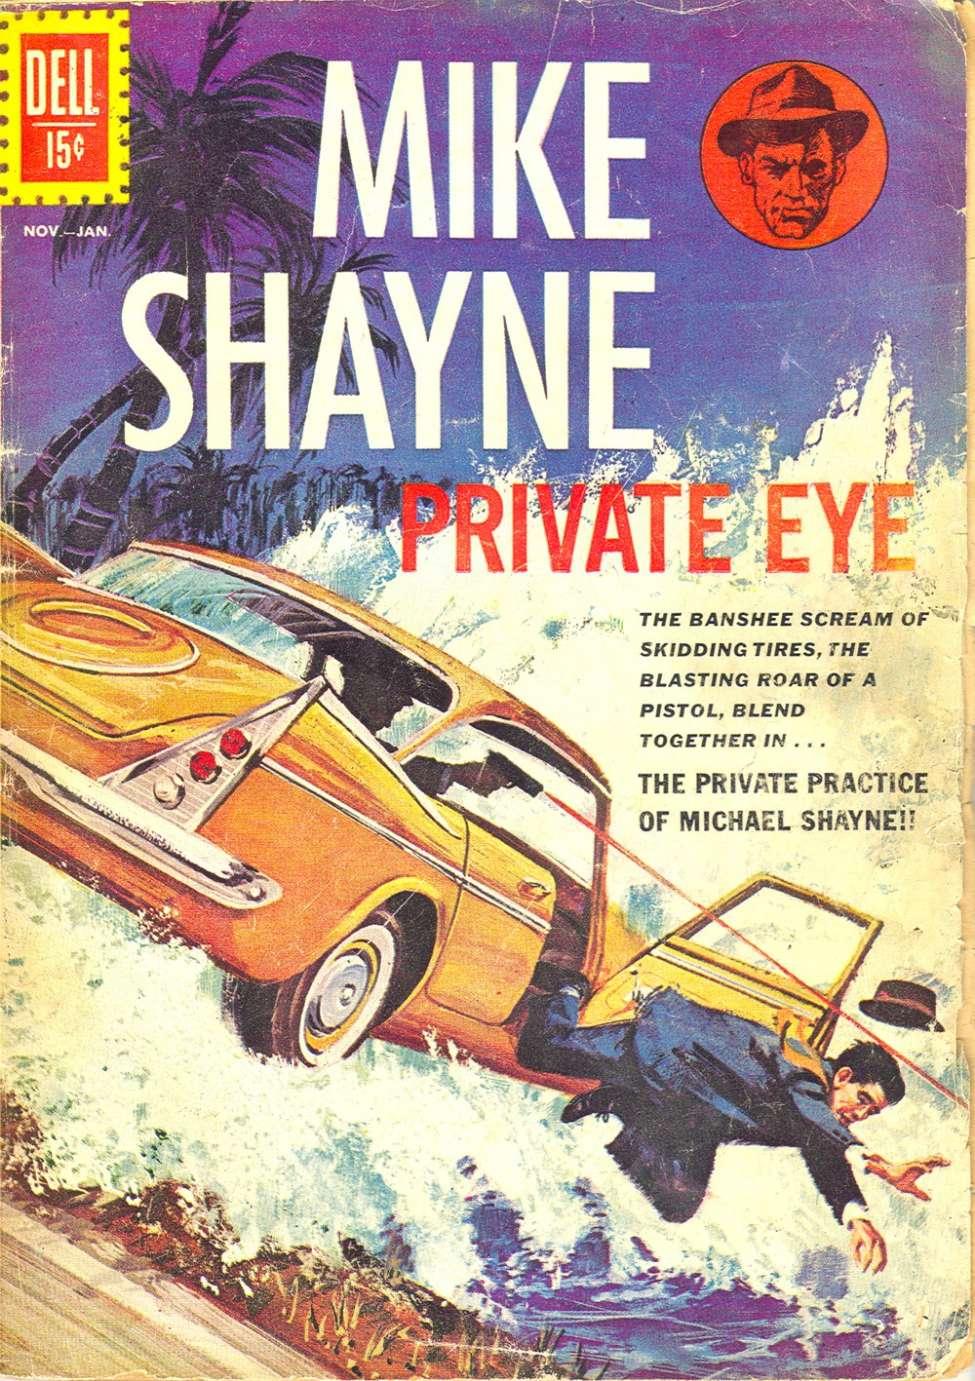 Mike shayne private eye 1 comic book plus comic book cover for mike shayne private eye 1 fandeluxe Document